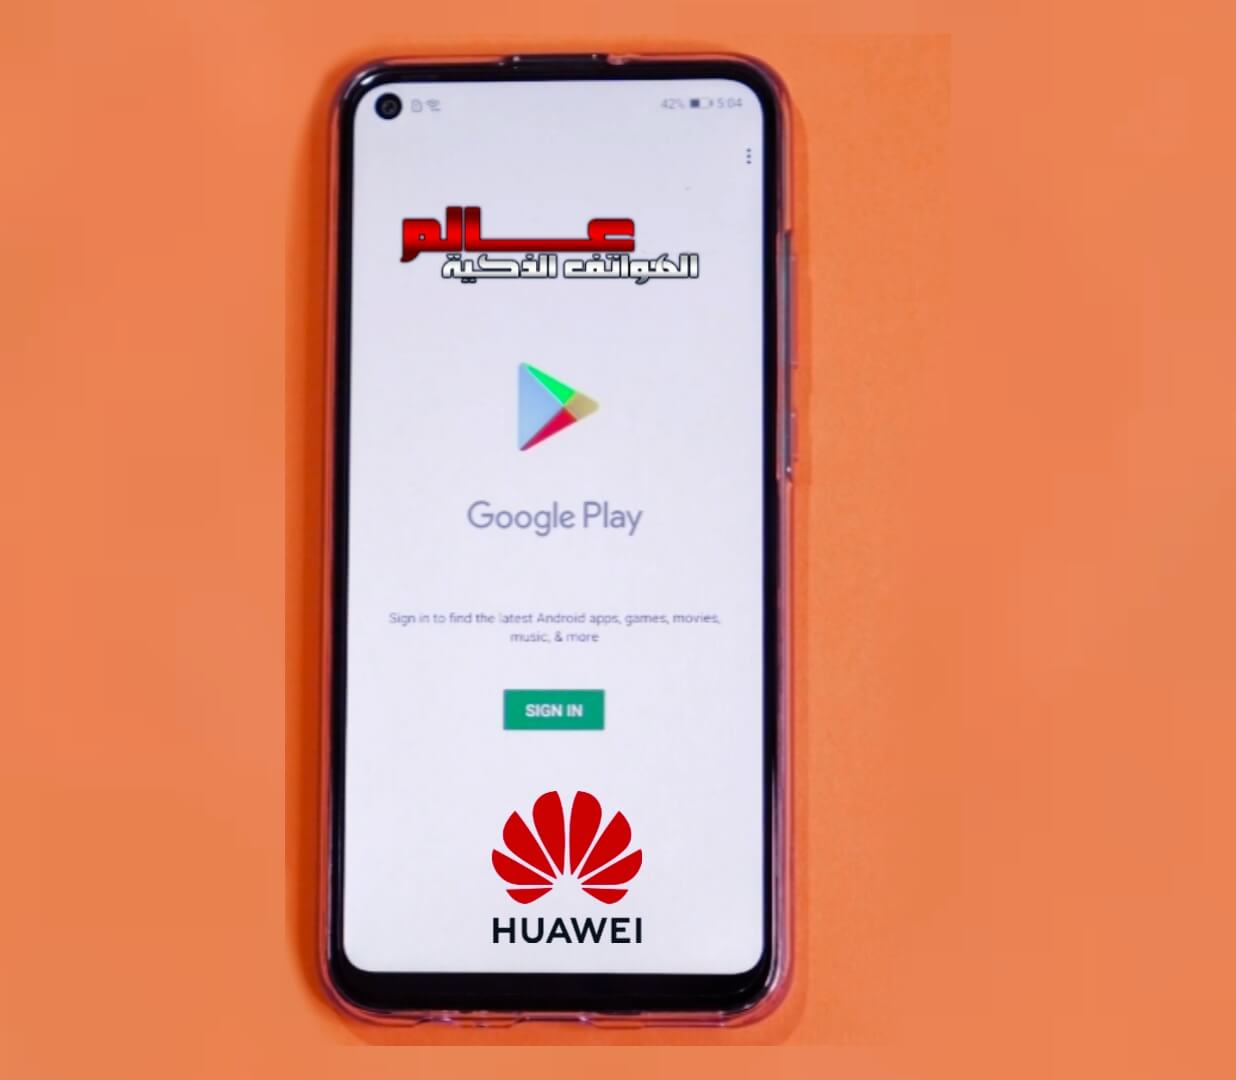 شرح طريقة تحميل متجر Google Play على هاتف هواوي Huawei Nova 7i